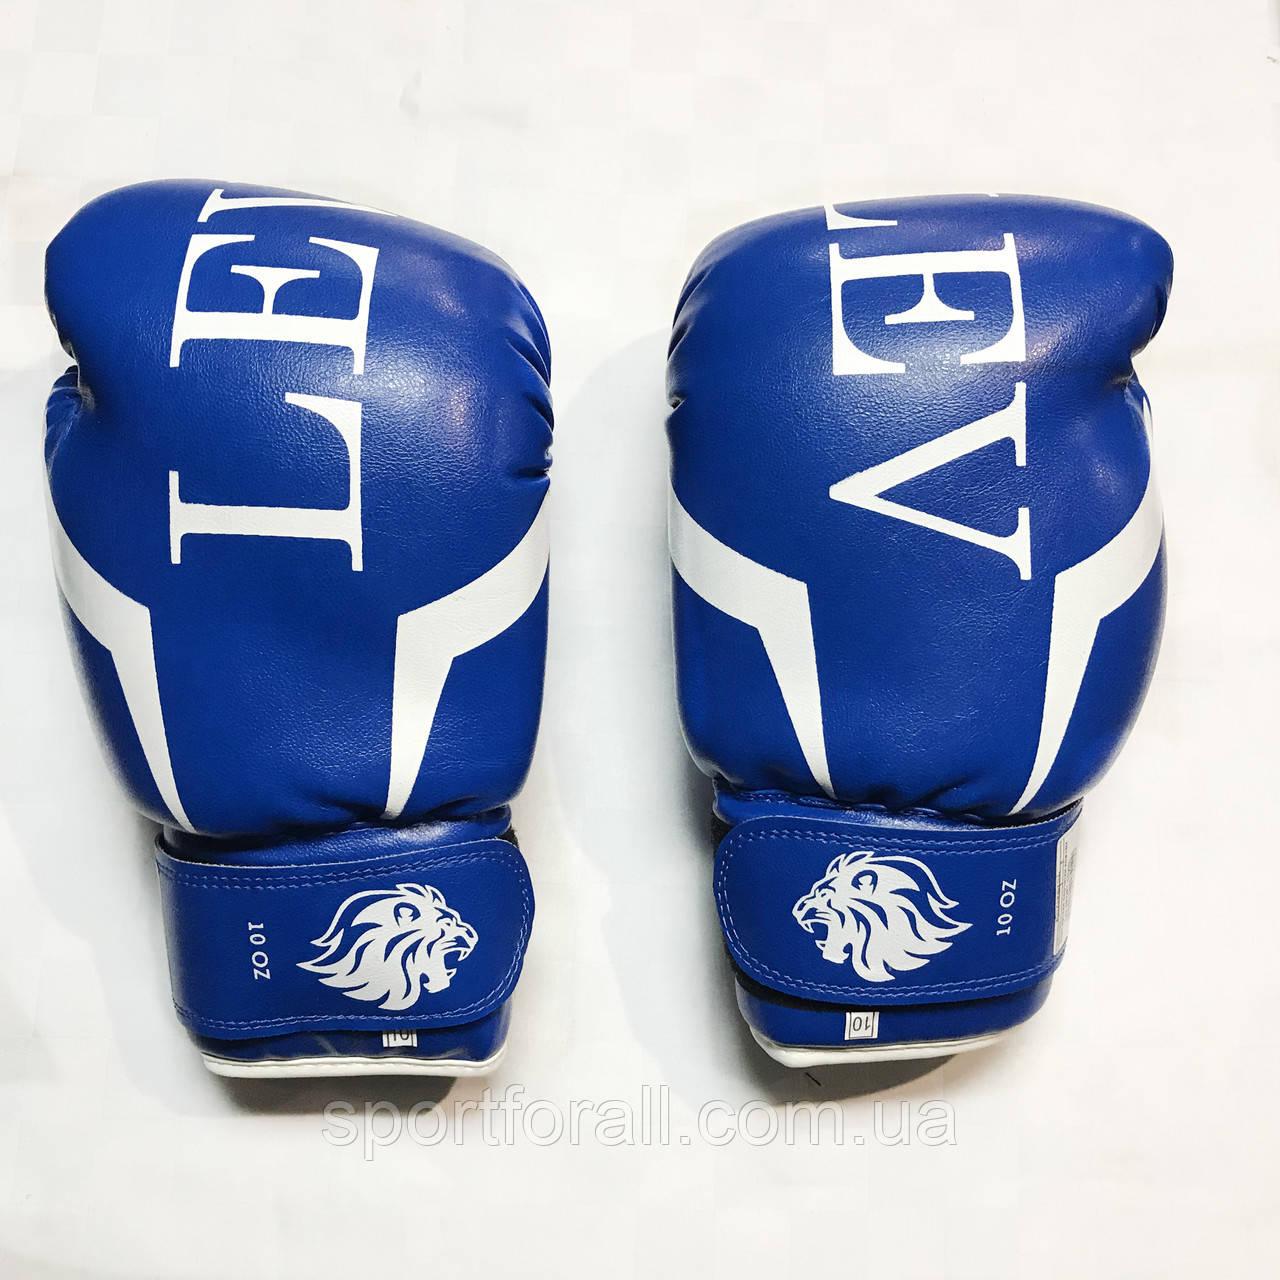 Боксерские перчатки LEV SPORT  8 унций (синий)